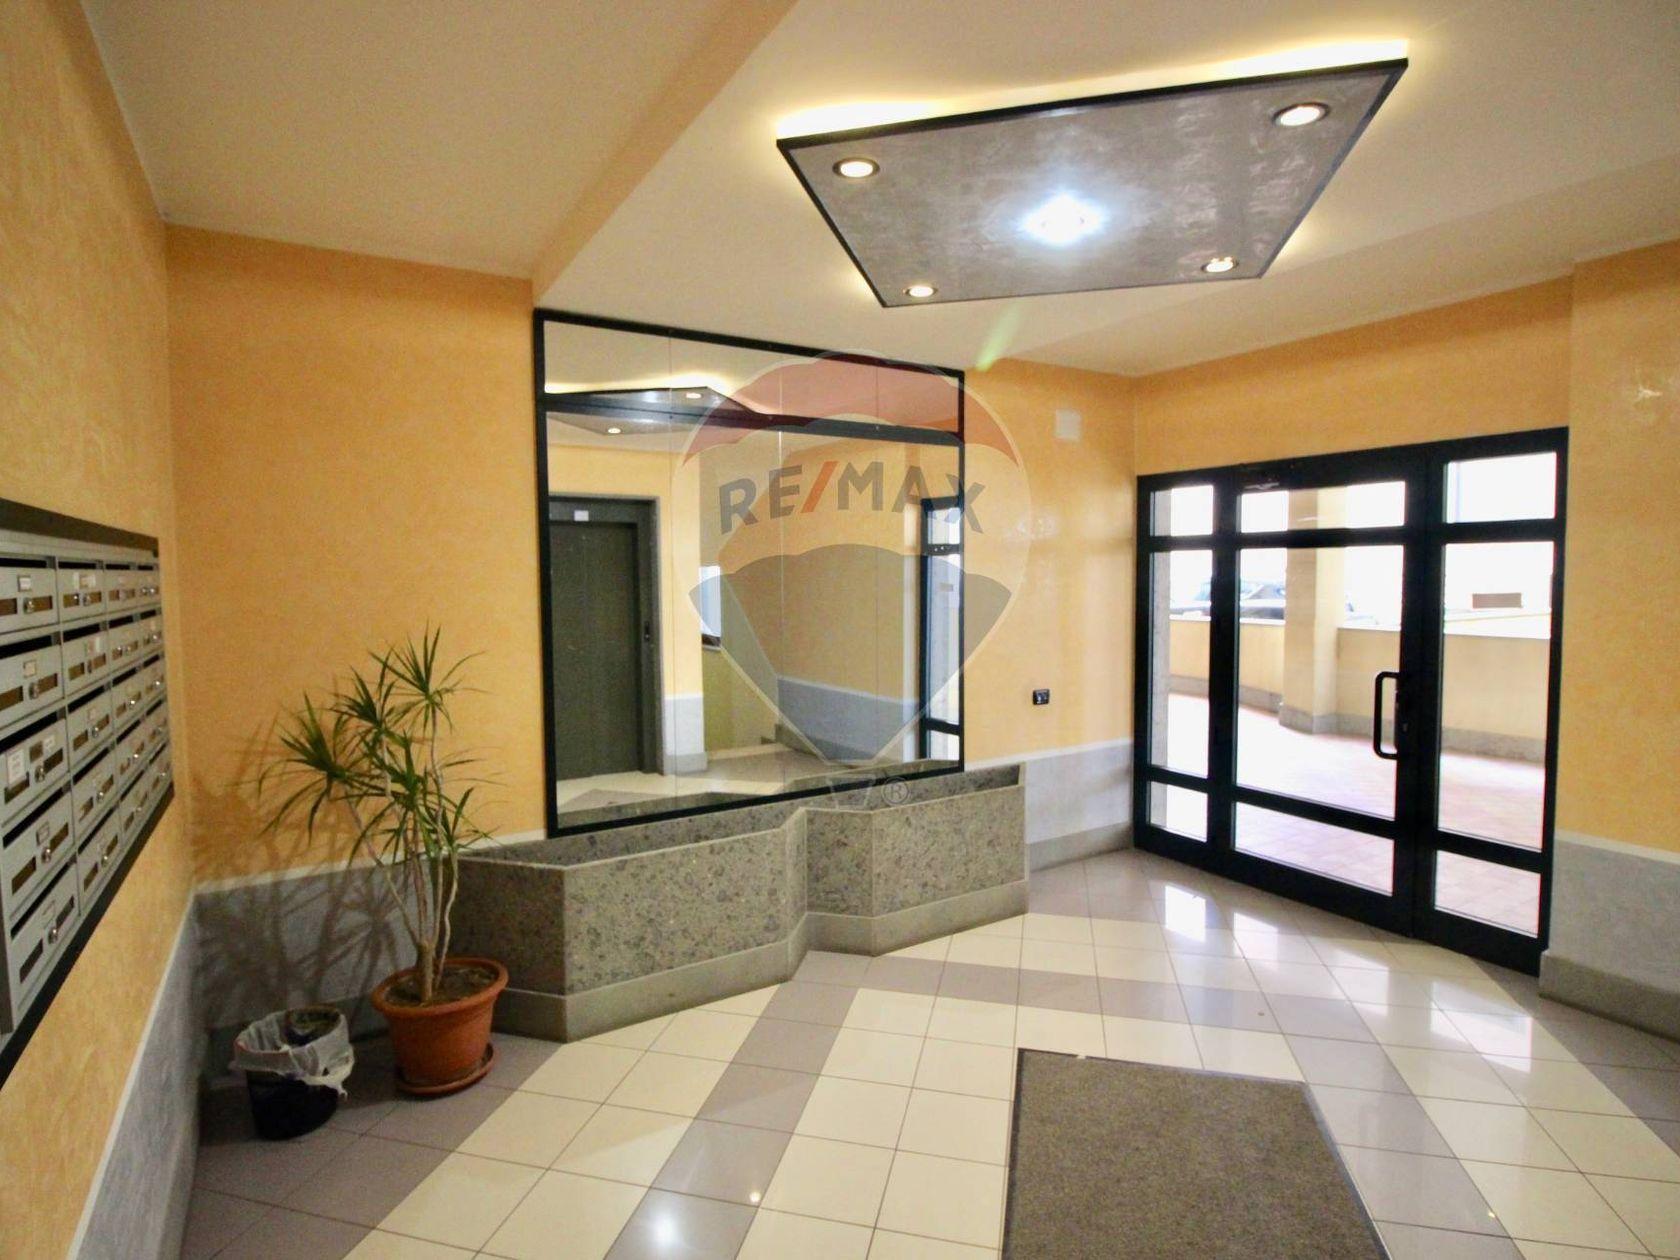 Appartamento Ss-s. Orsola Storica, Sassari, SS Vendita - Foto 17